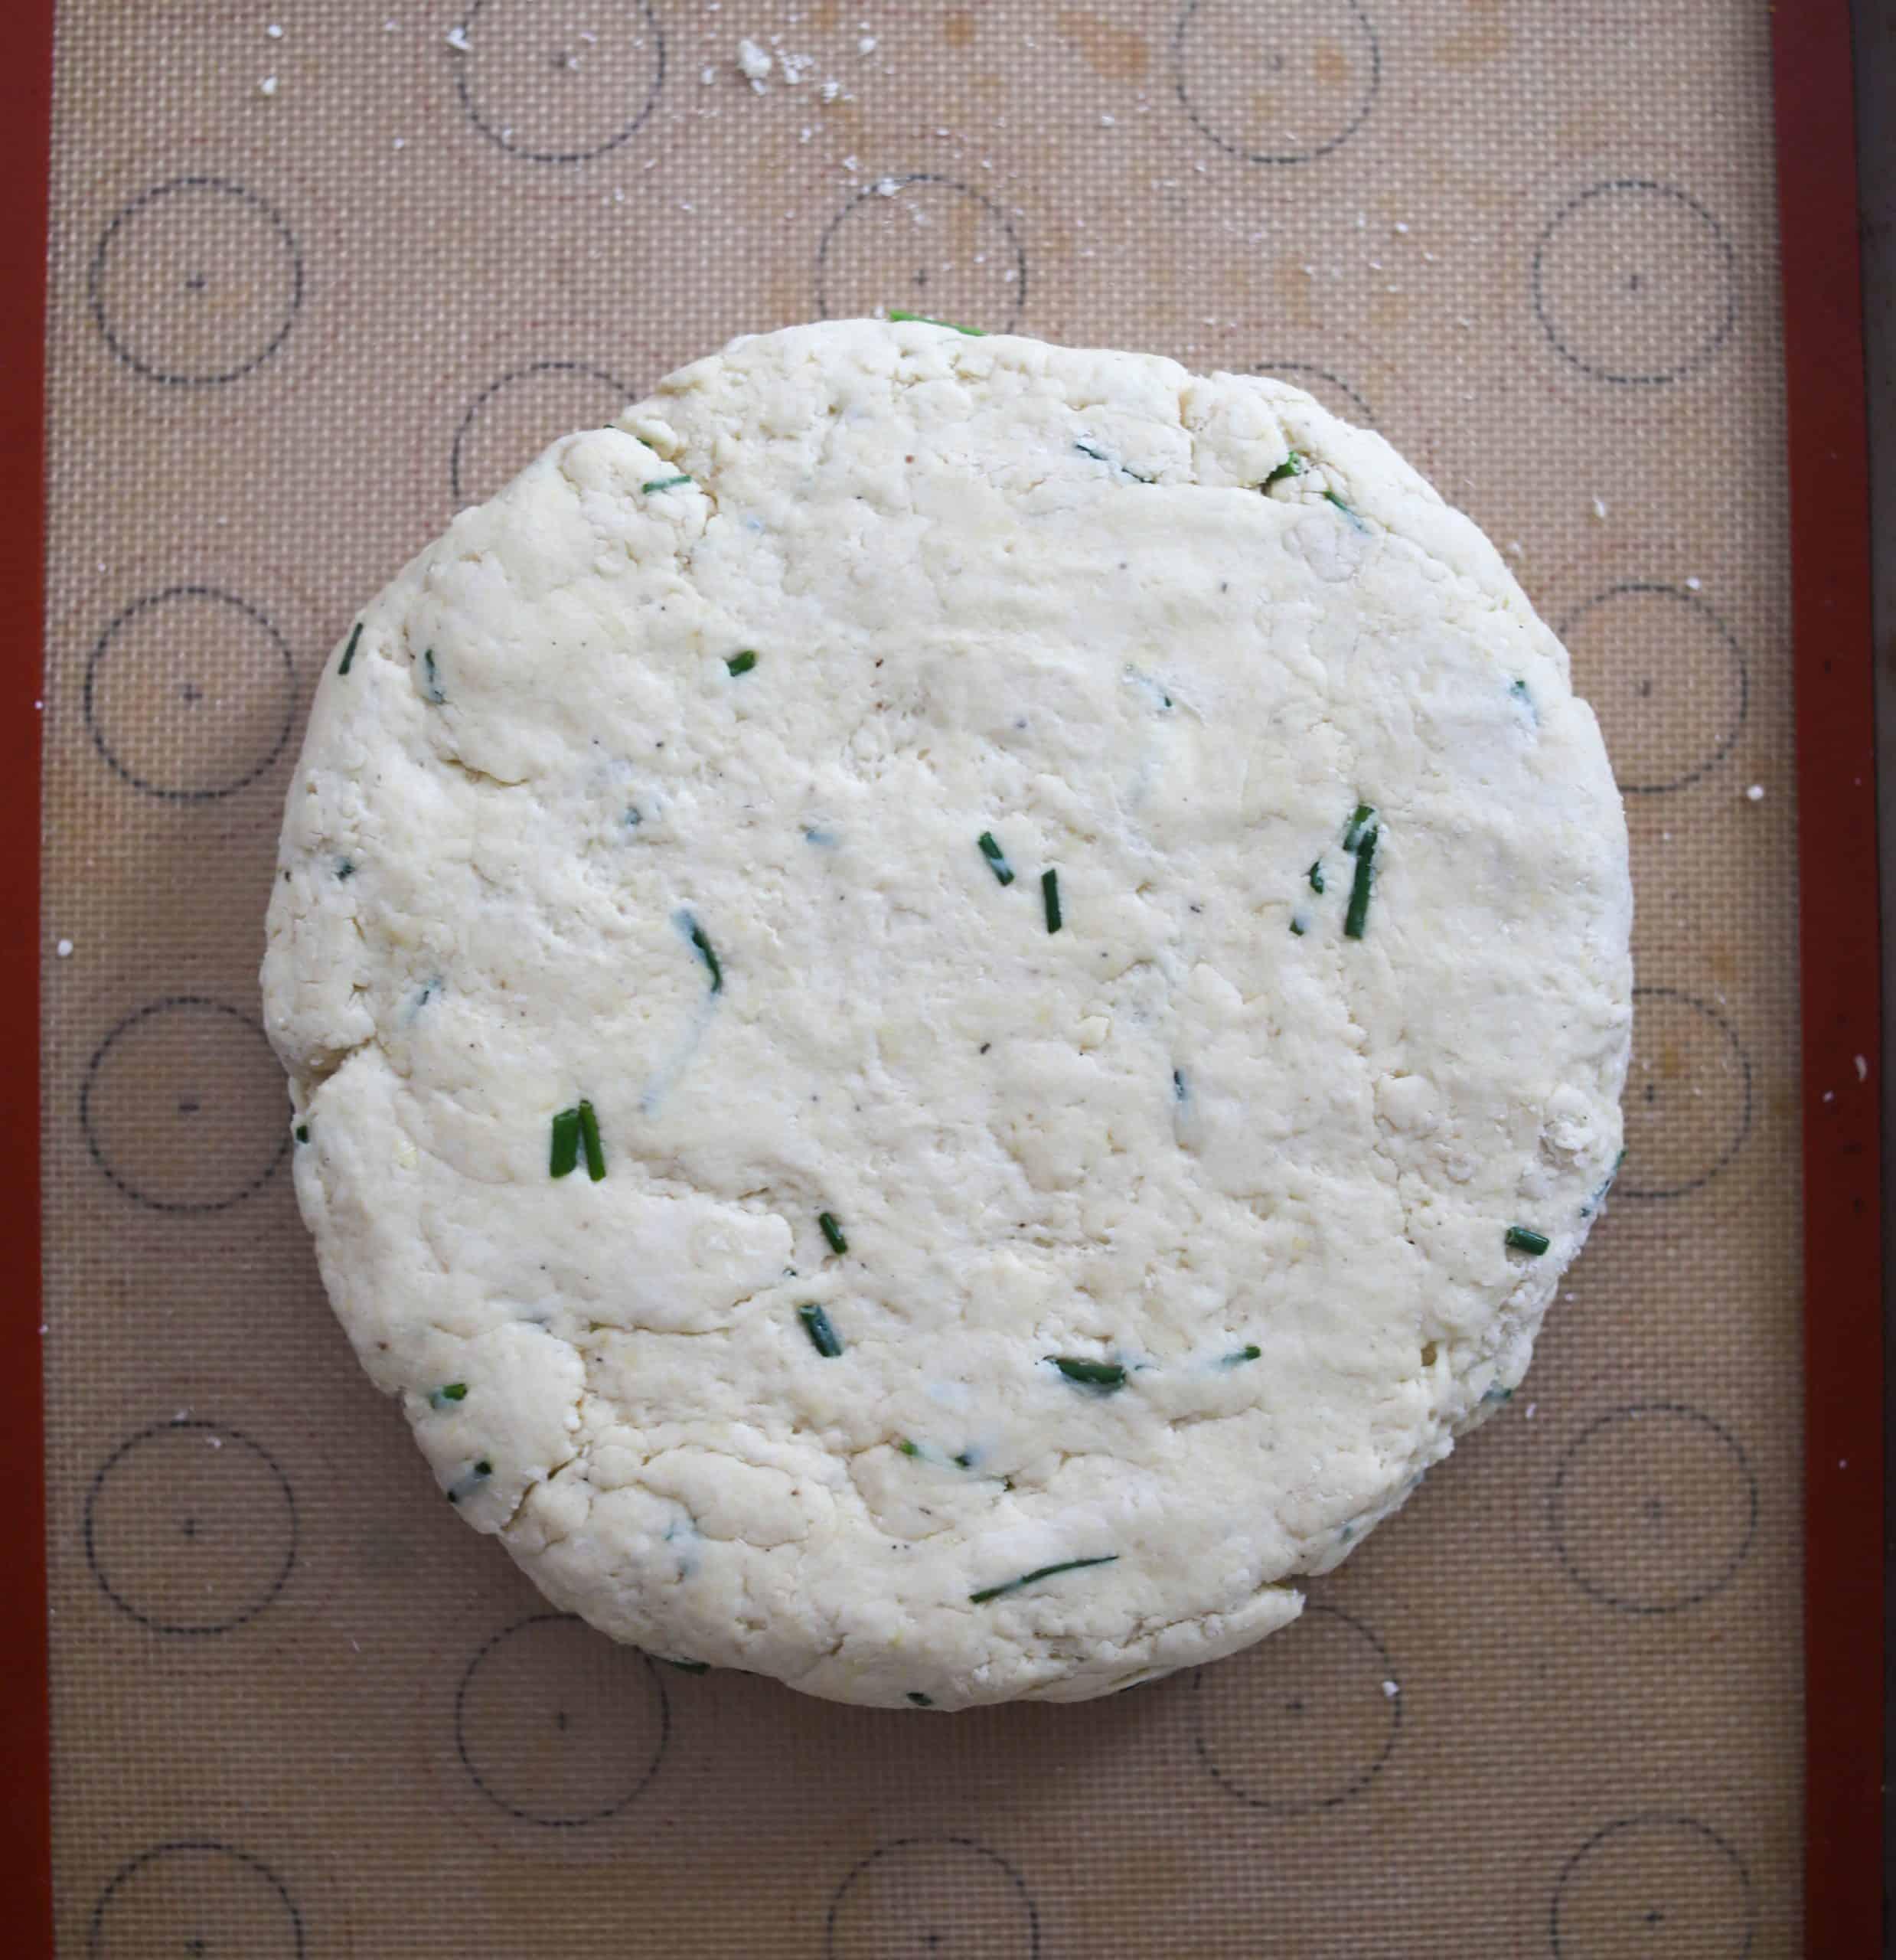 cheddar Irish soda bread dough shaped into a round on a baking sheet